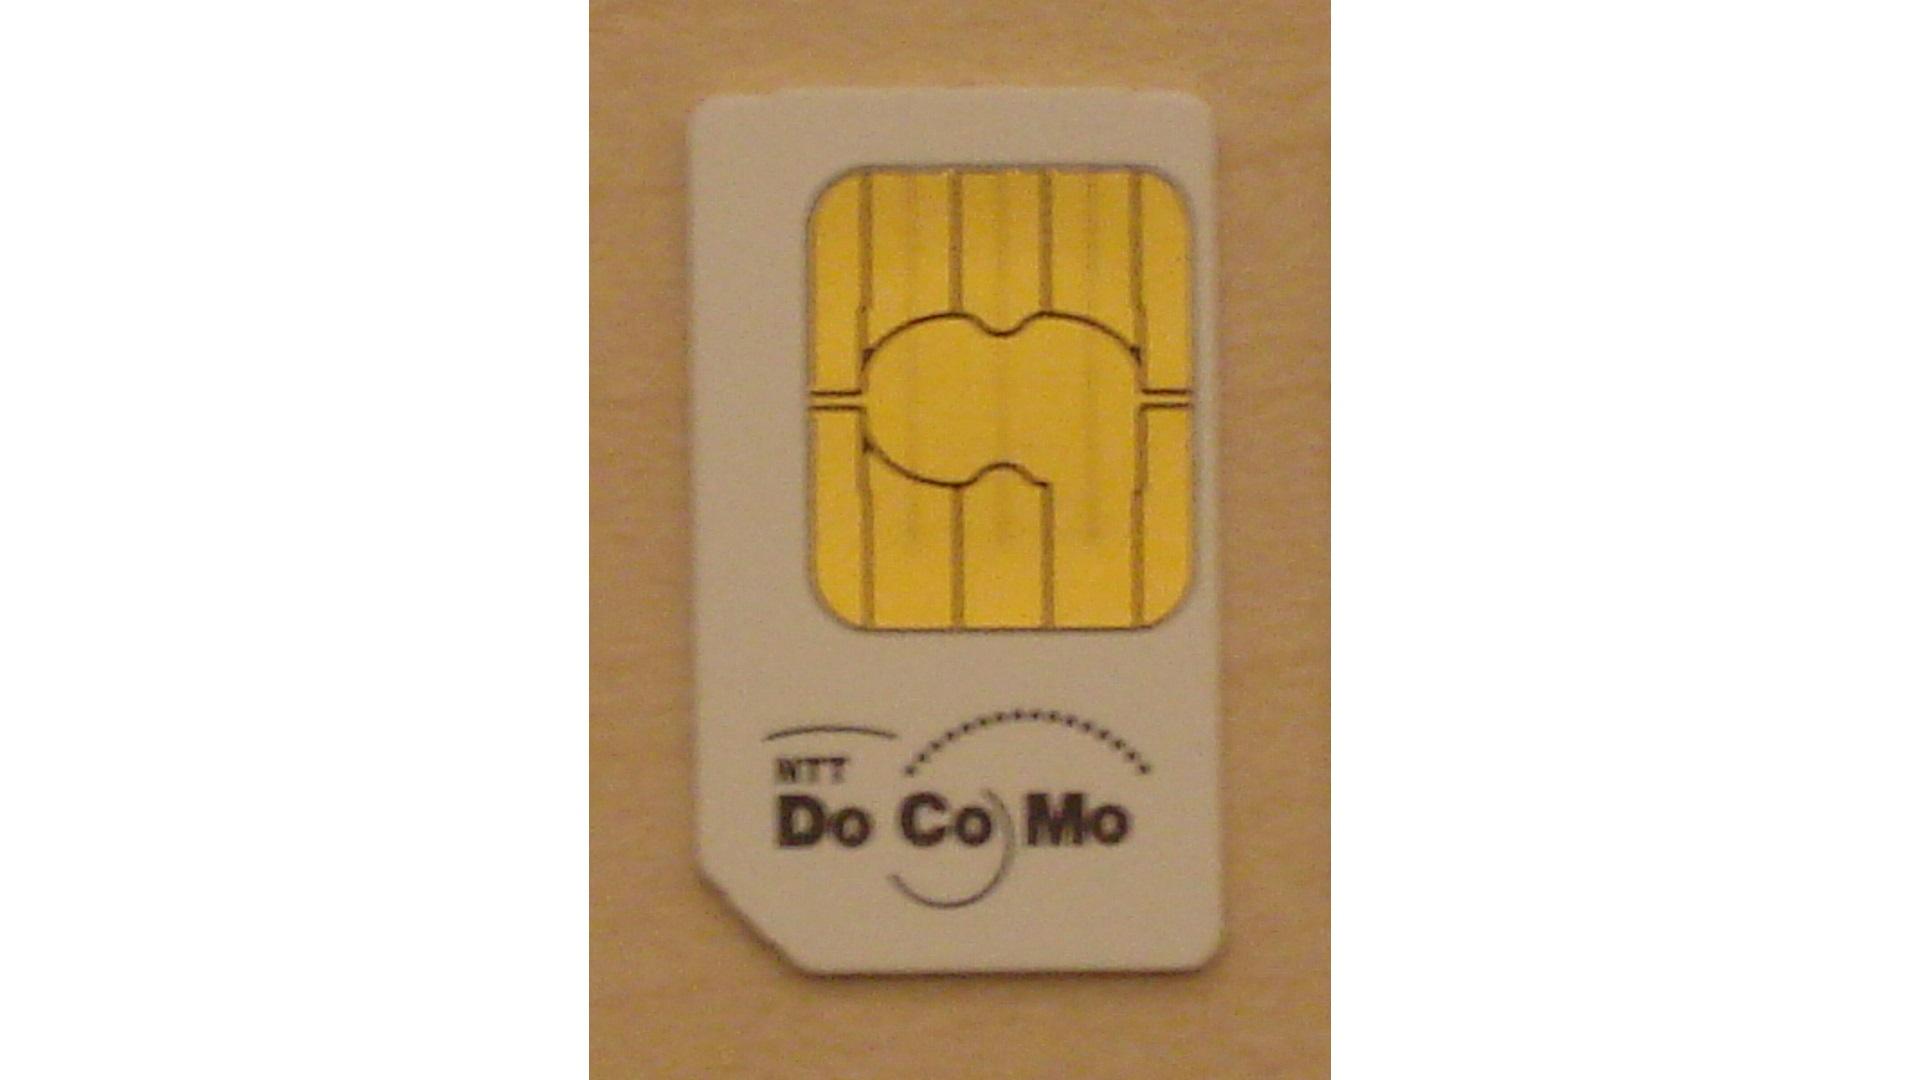 「KEYone」FOMAやMVNOで電波を掴まない場合の対処方!【KEYone Tips】(修正)